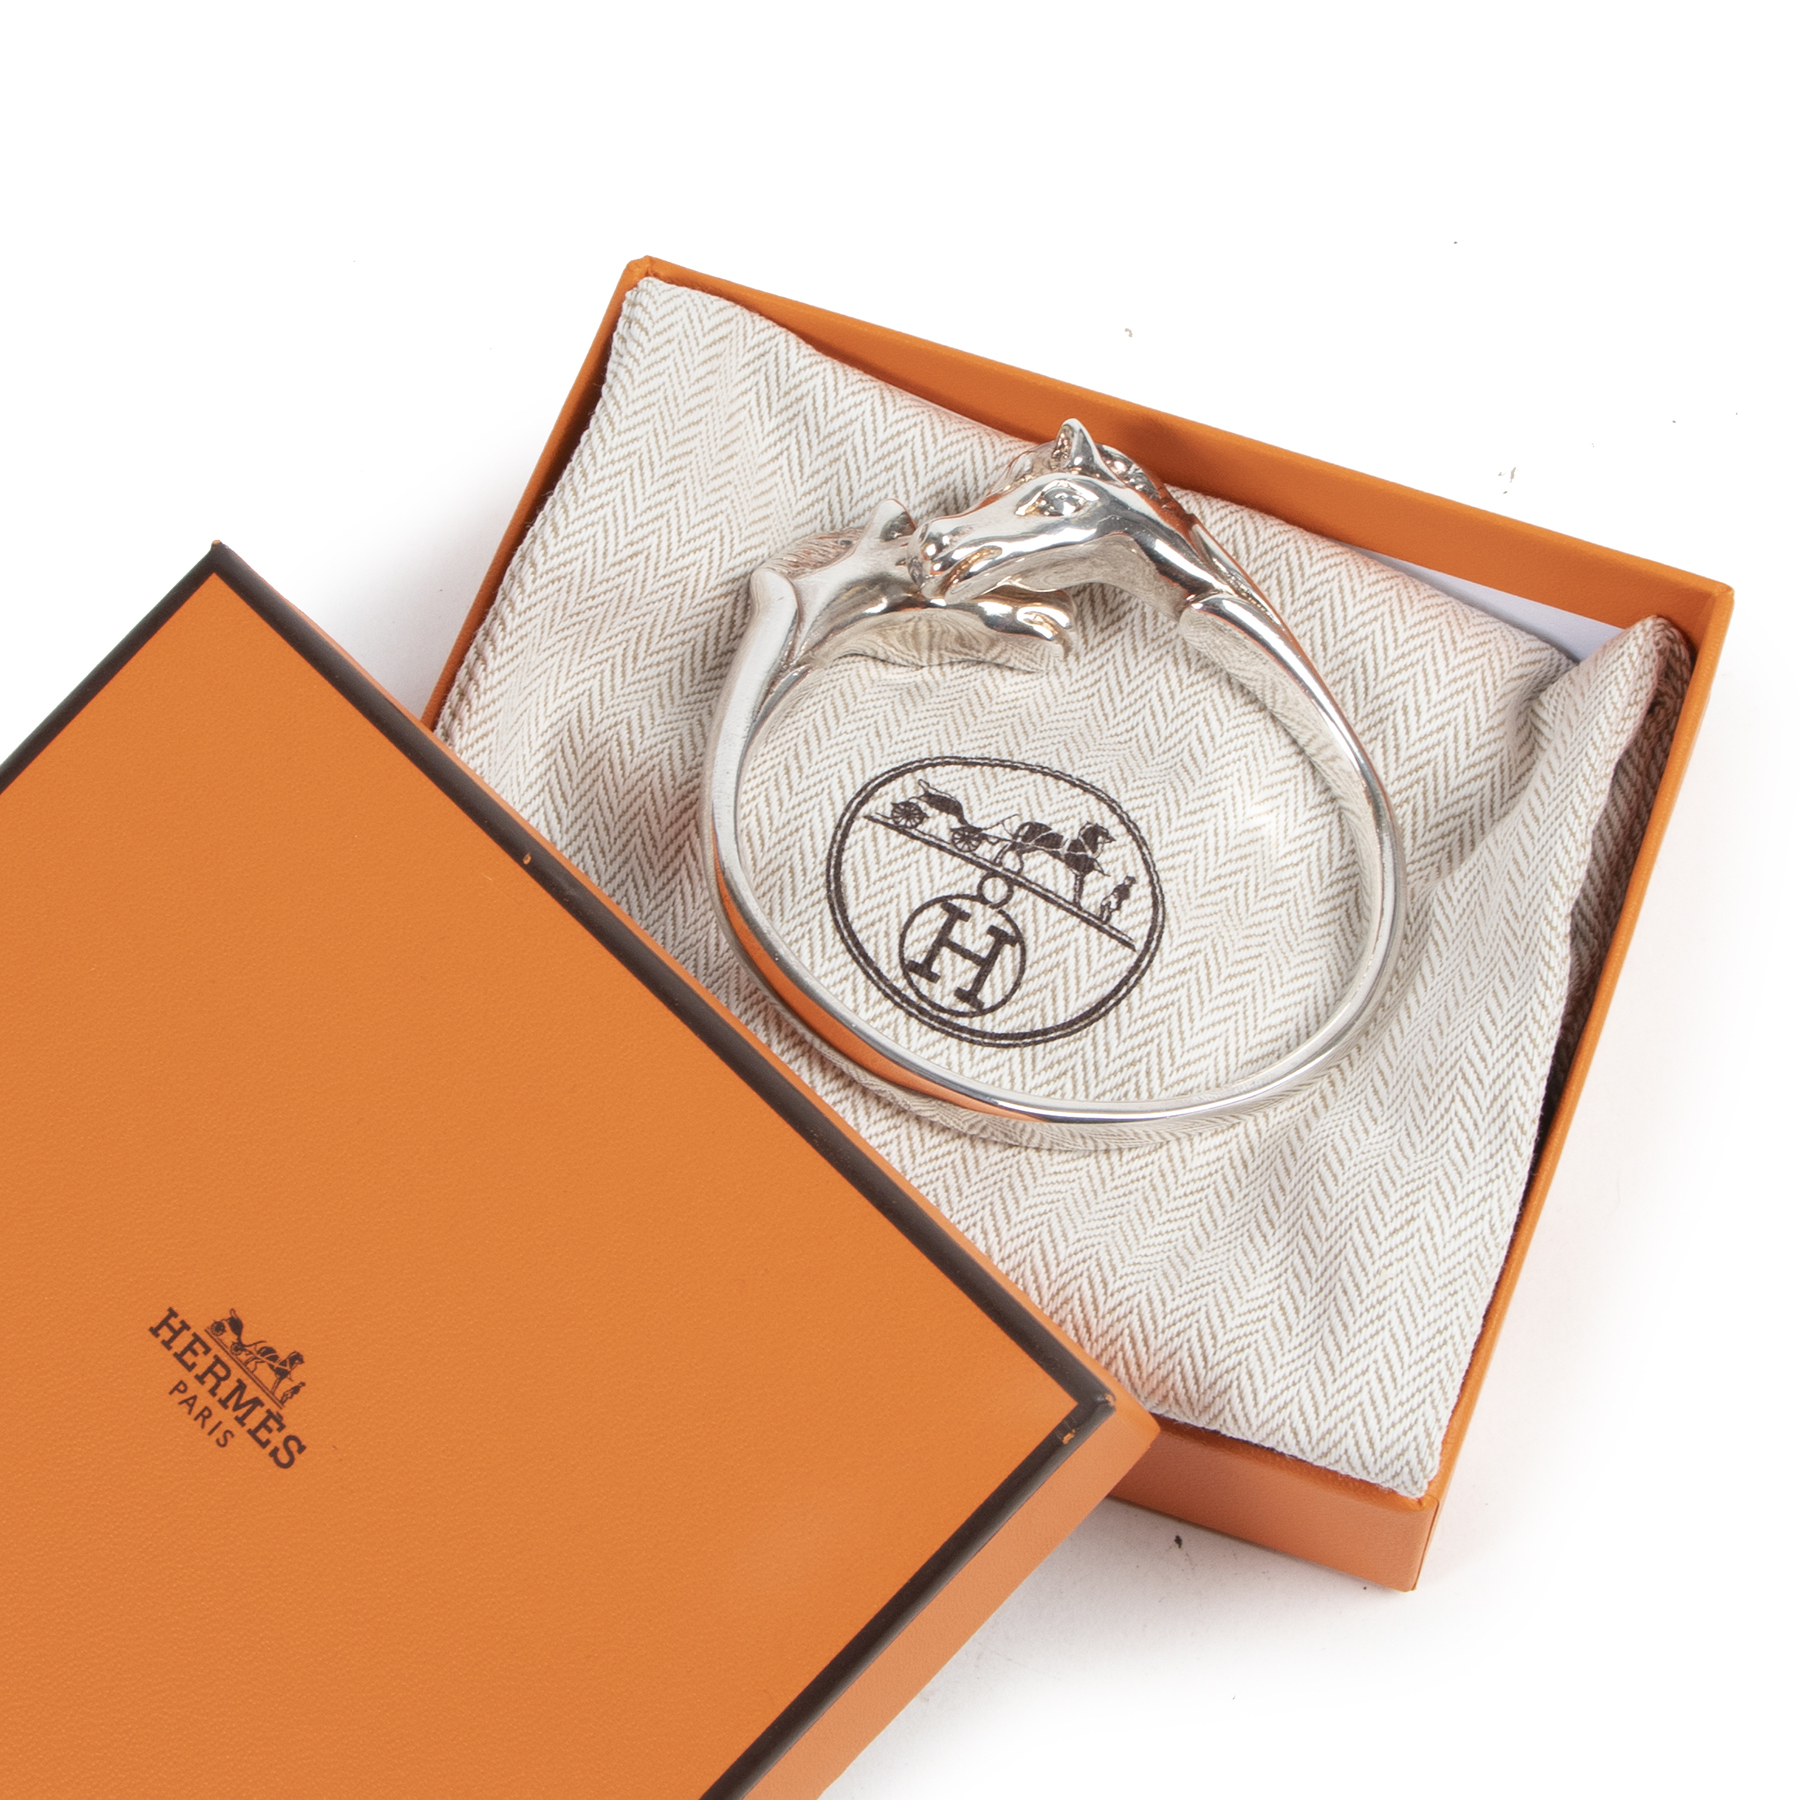 Authentic secondhand Hermes Silver Cheval Horse Bangle Bracelet designer accessories fashion luxury vintage webshop safe secure online shopping